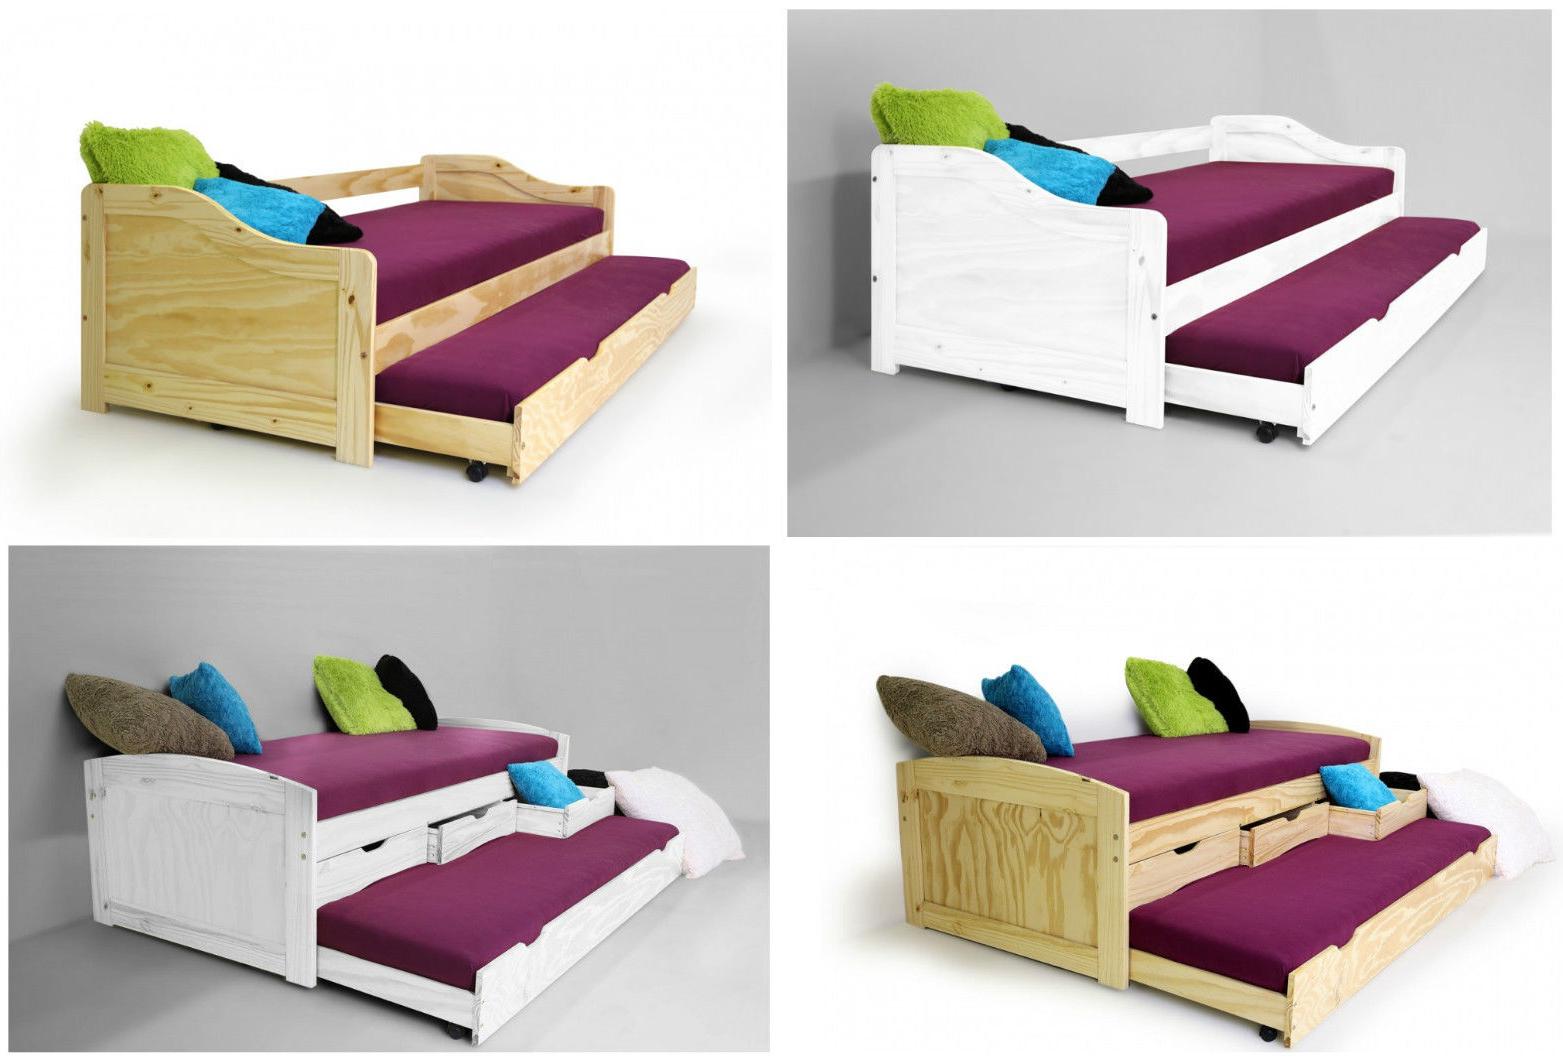 kinderbett jugendbett tandemliege g stebett massivholz kojenbett natur oder wei ebay. Black Bedroom Furniture Sets. Home Design Ideas